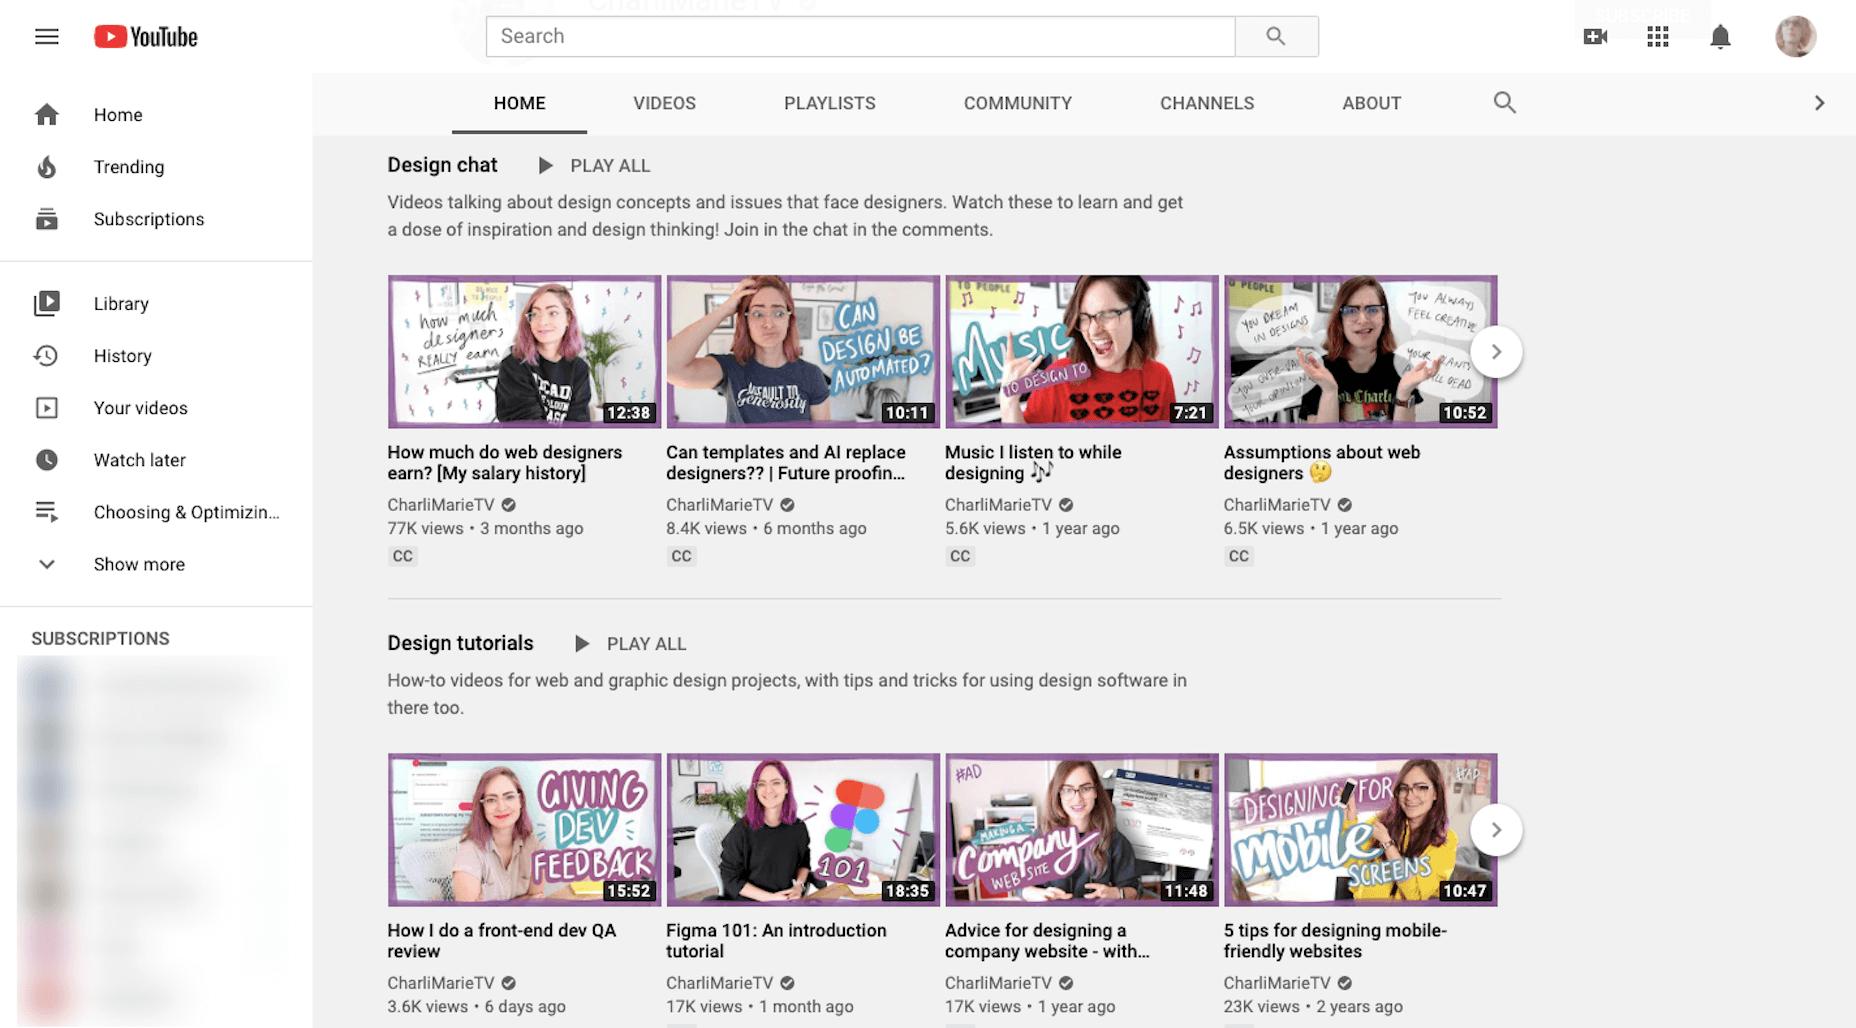 Chaîne YouTube CharliMarieTV et cours